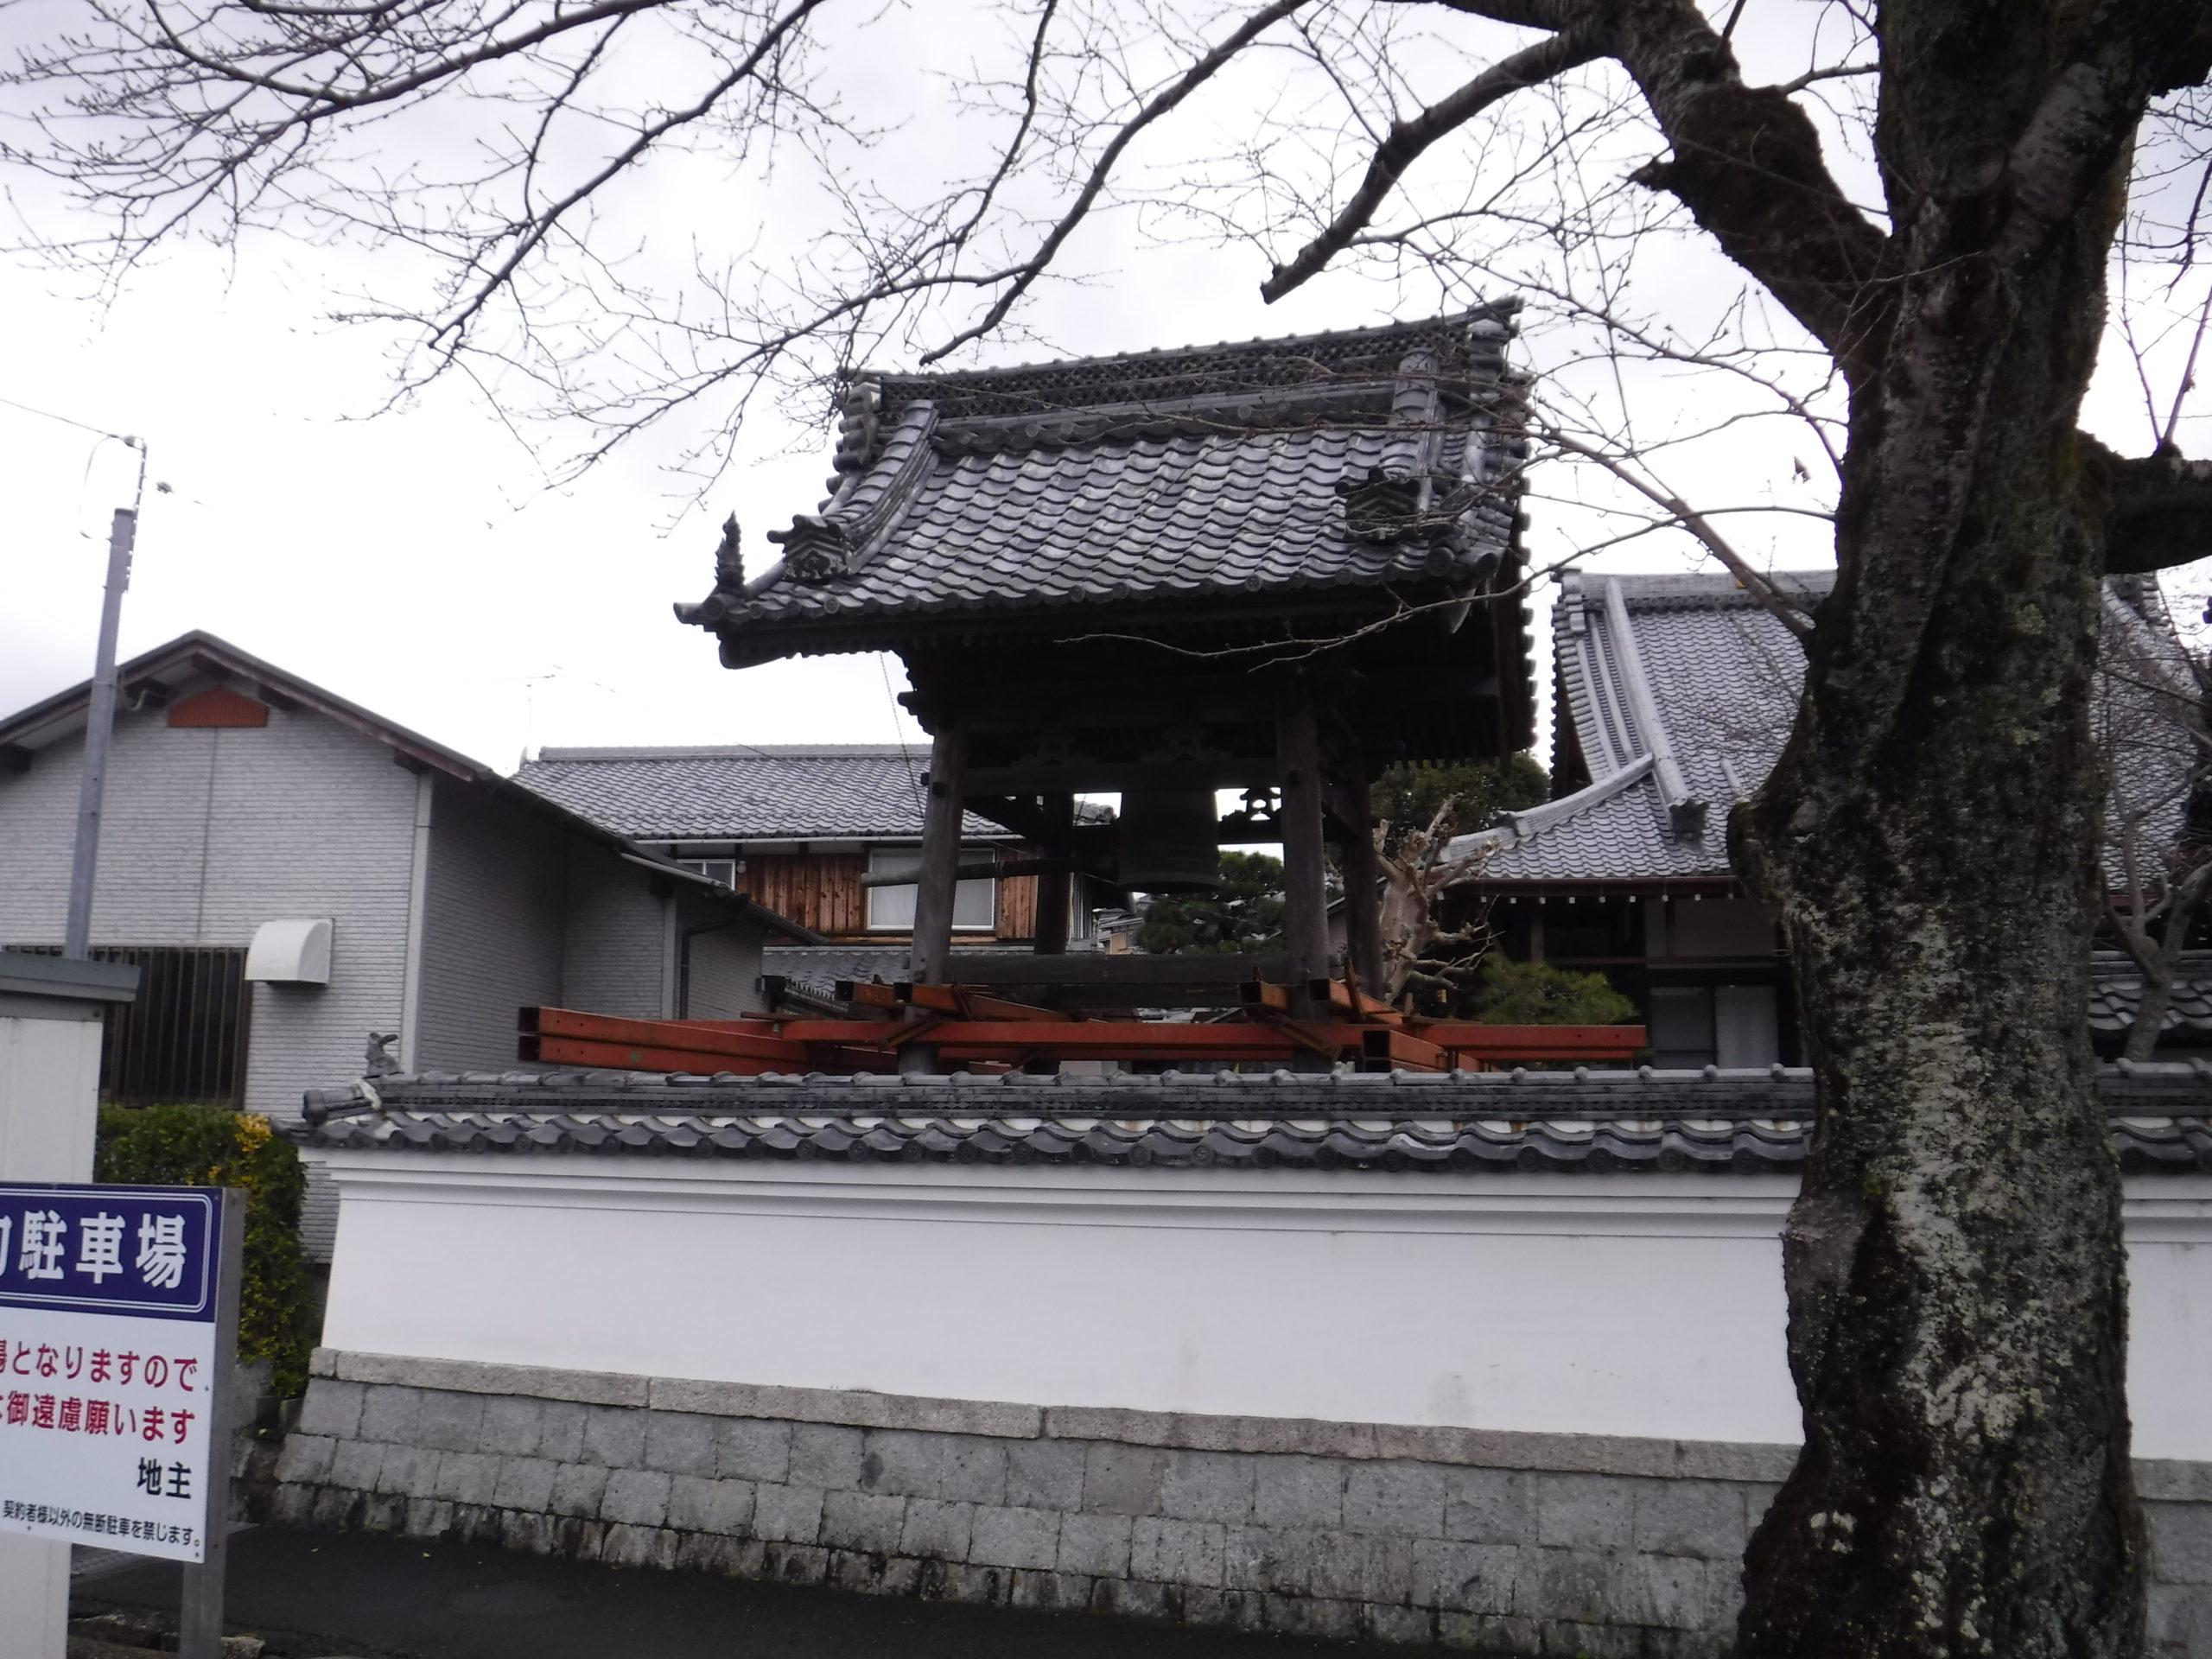 滋賀県大津市の寿命寺様 鐘楼堂